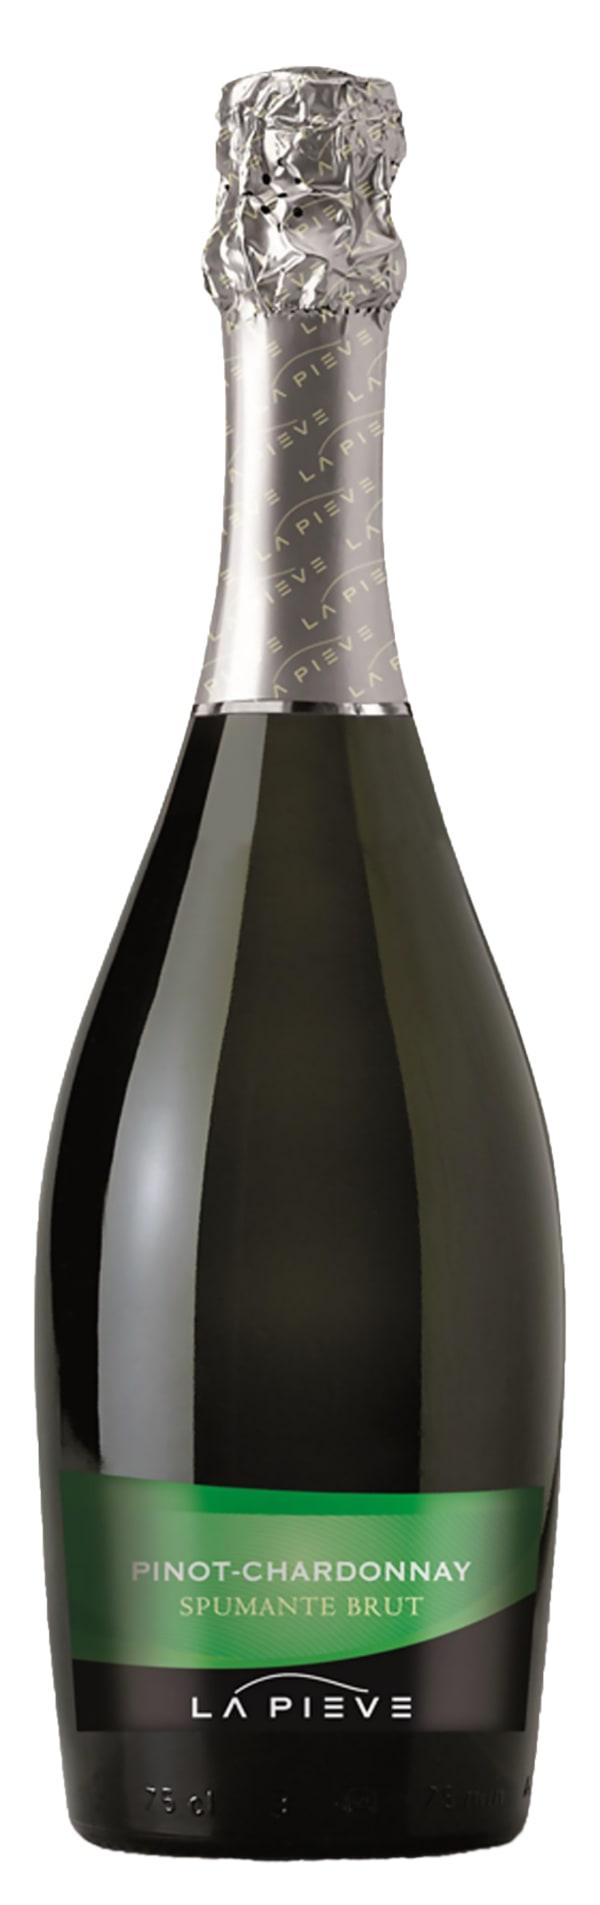 La Pieve Pinot Chardonnay Brut